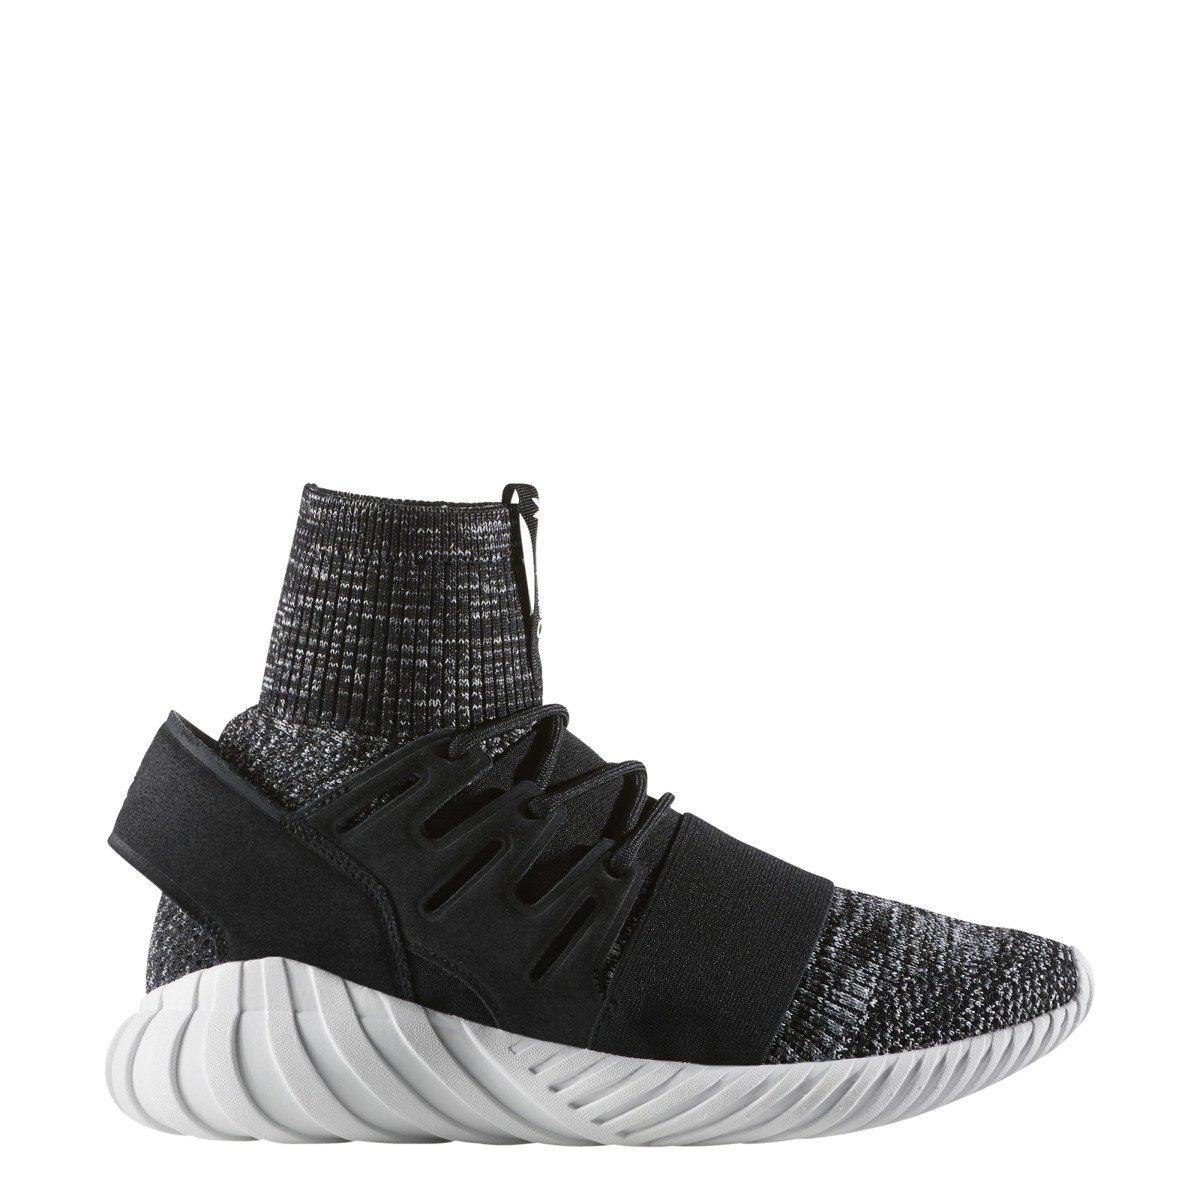 Triple Black Adidas Tubular Doom | Sole Collector